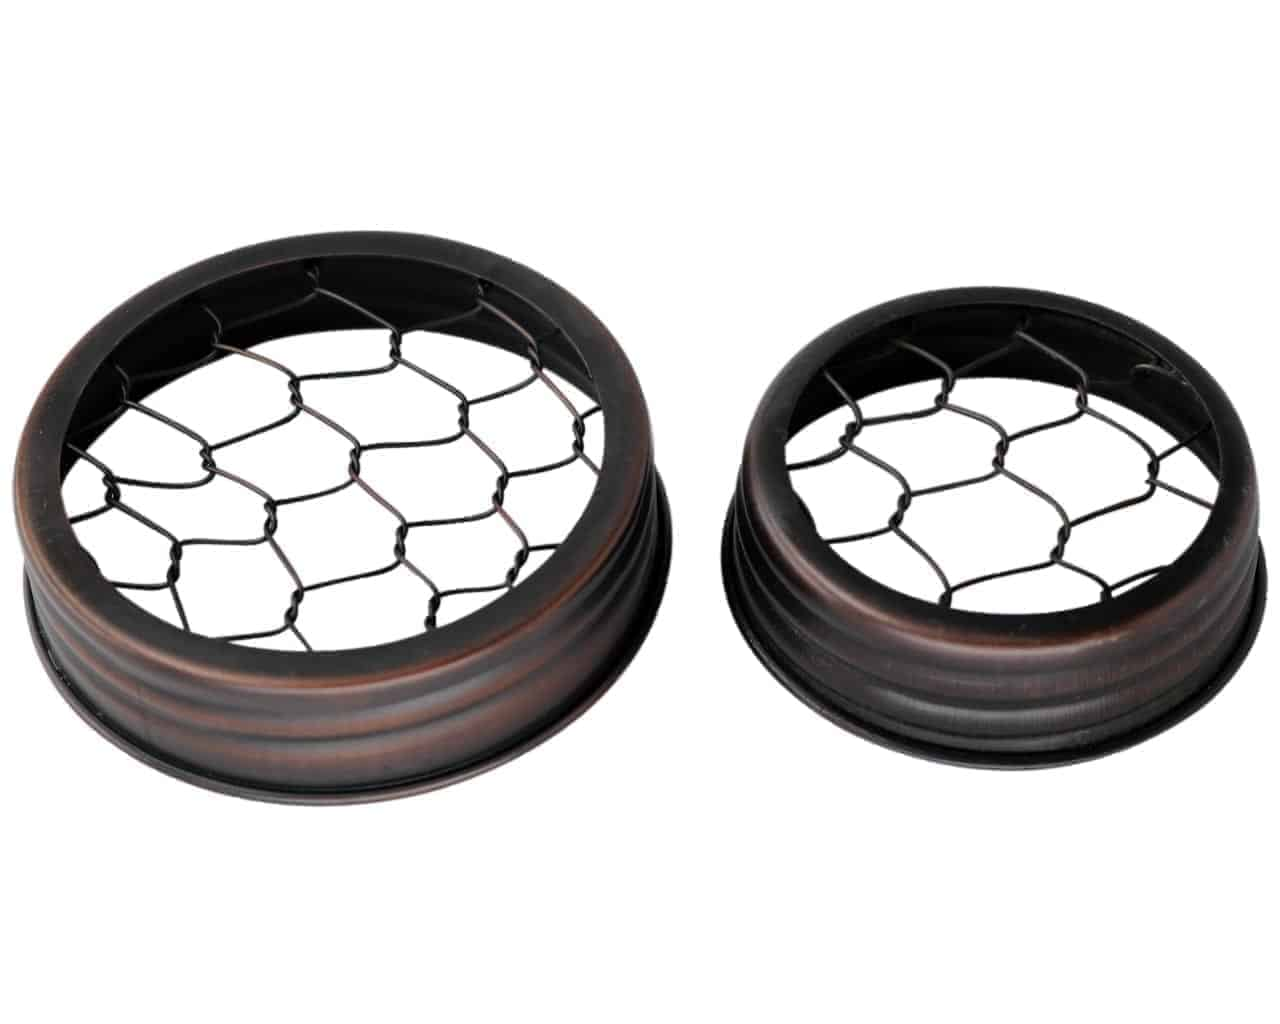 oil rubbed bronze flower organizer frog lid for mason jars